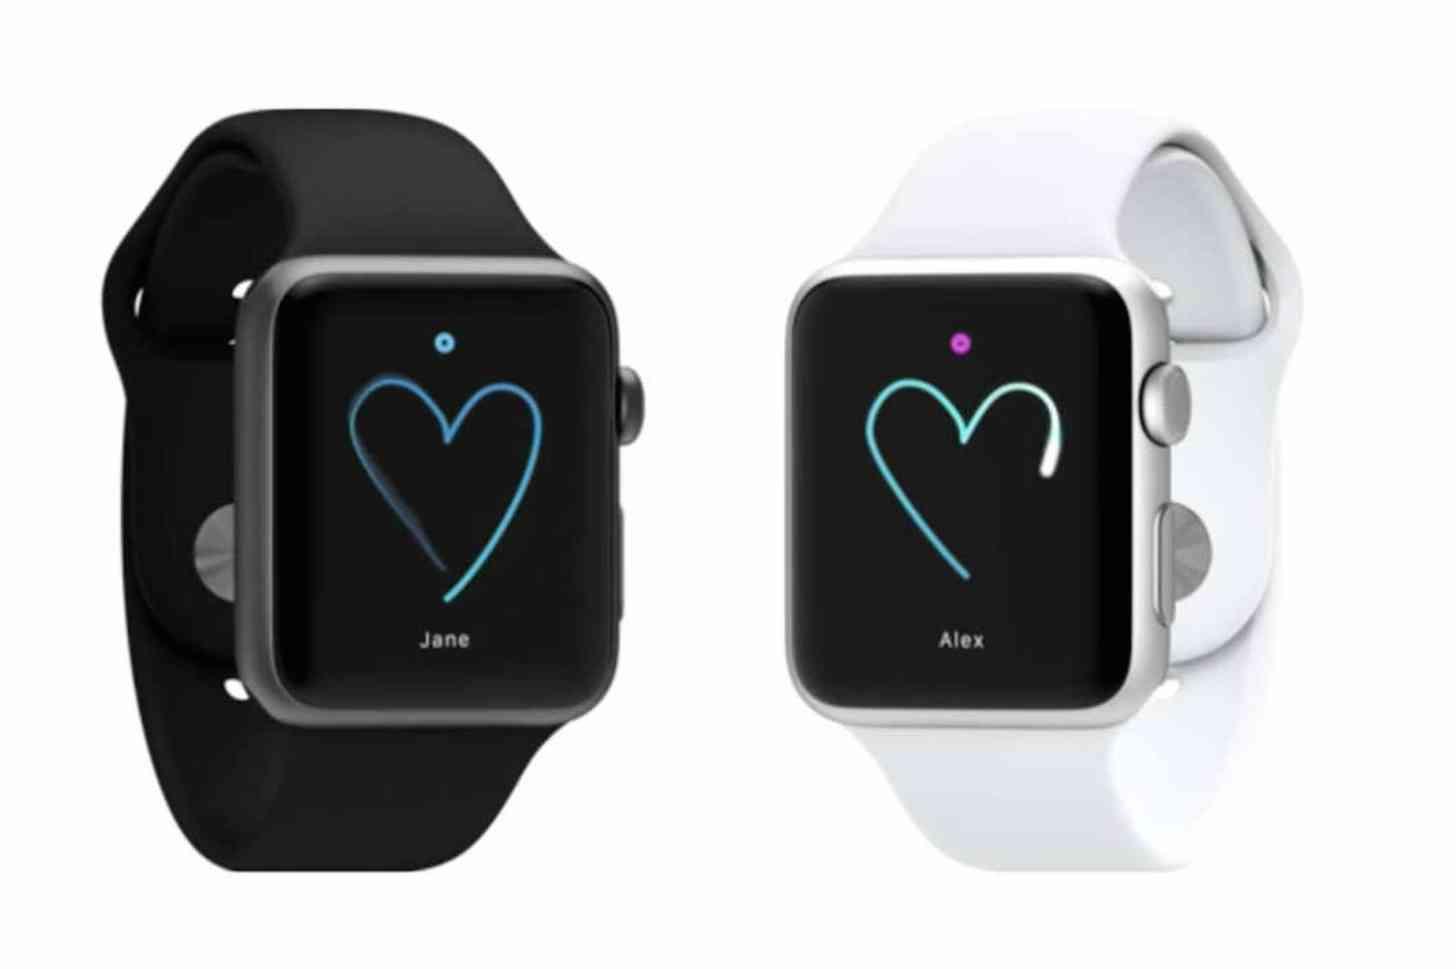 Apple Watch drawing